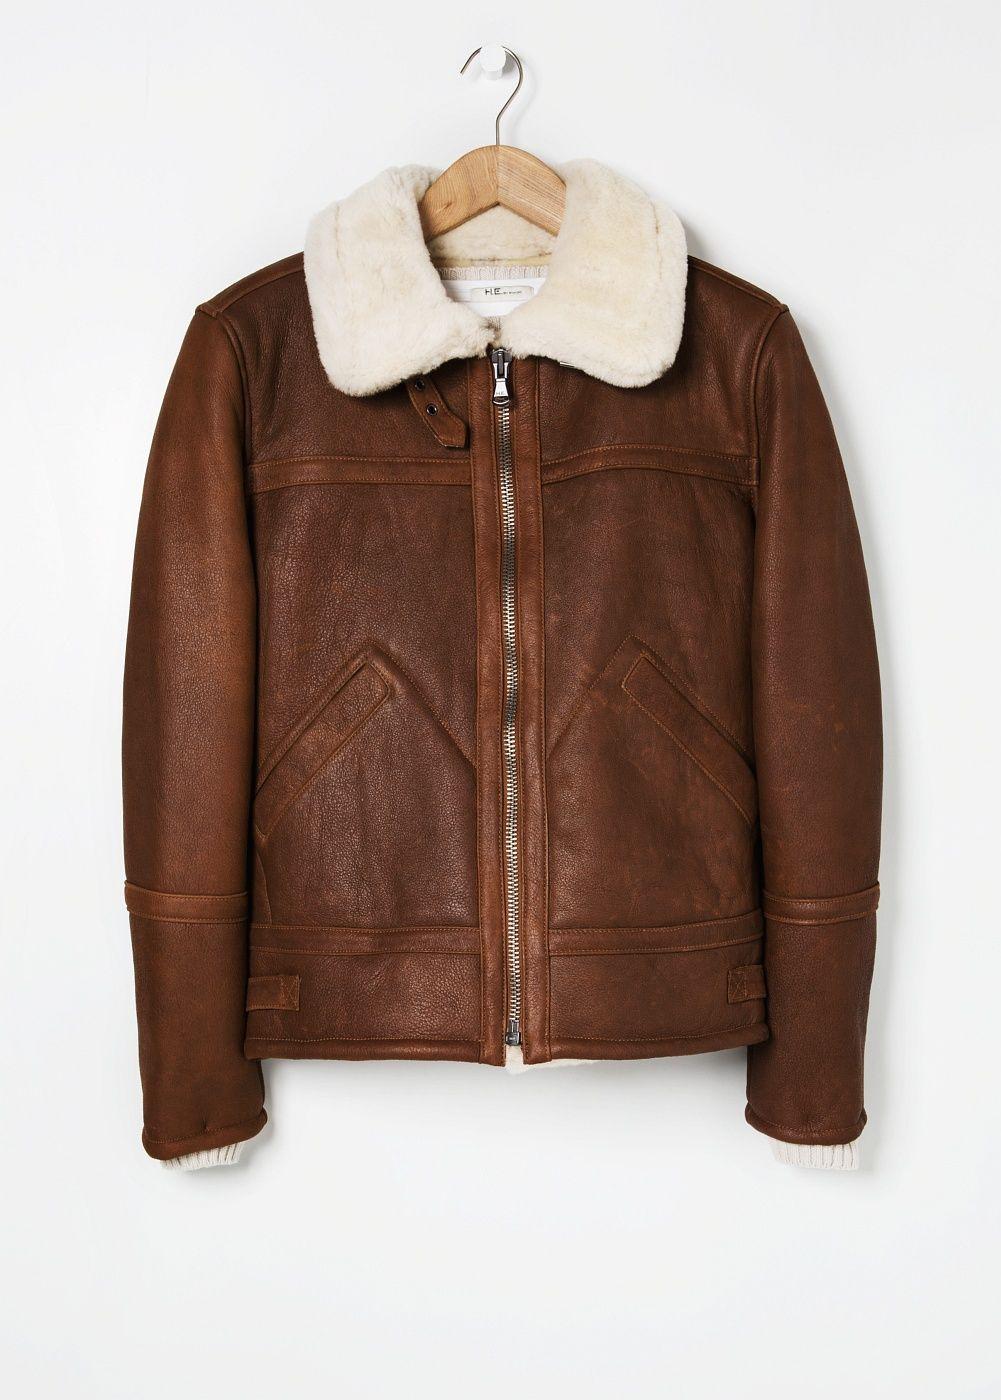 Furlined Leather Aviator Fashion, Leather jacket, Mens